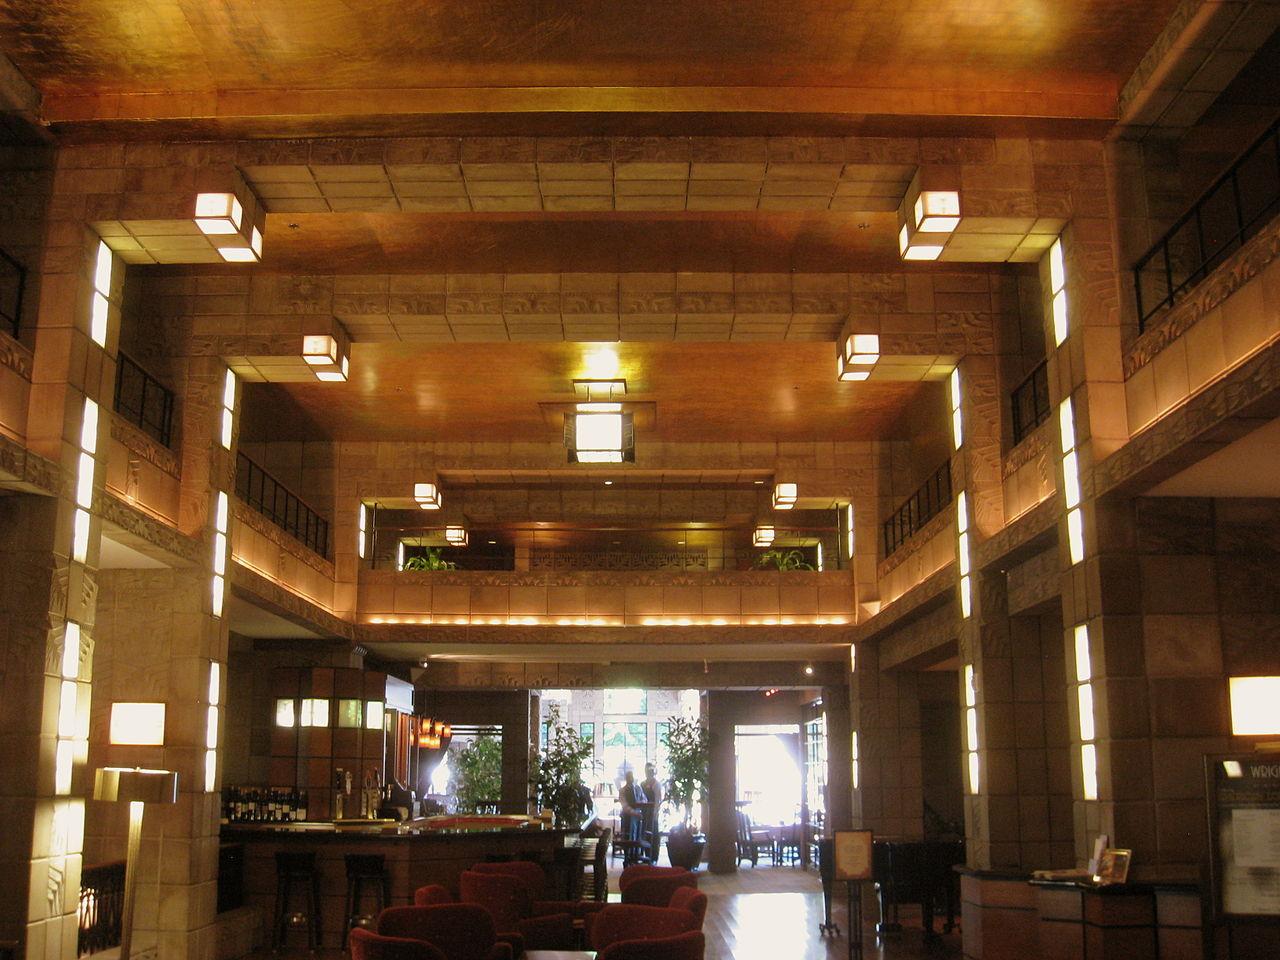 1280px-Arizona_Biltmore_-_interior_1.JPG